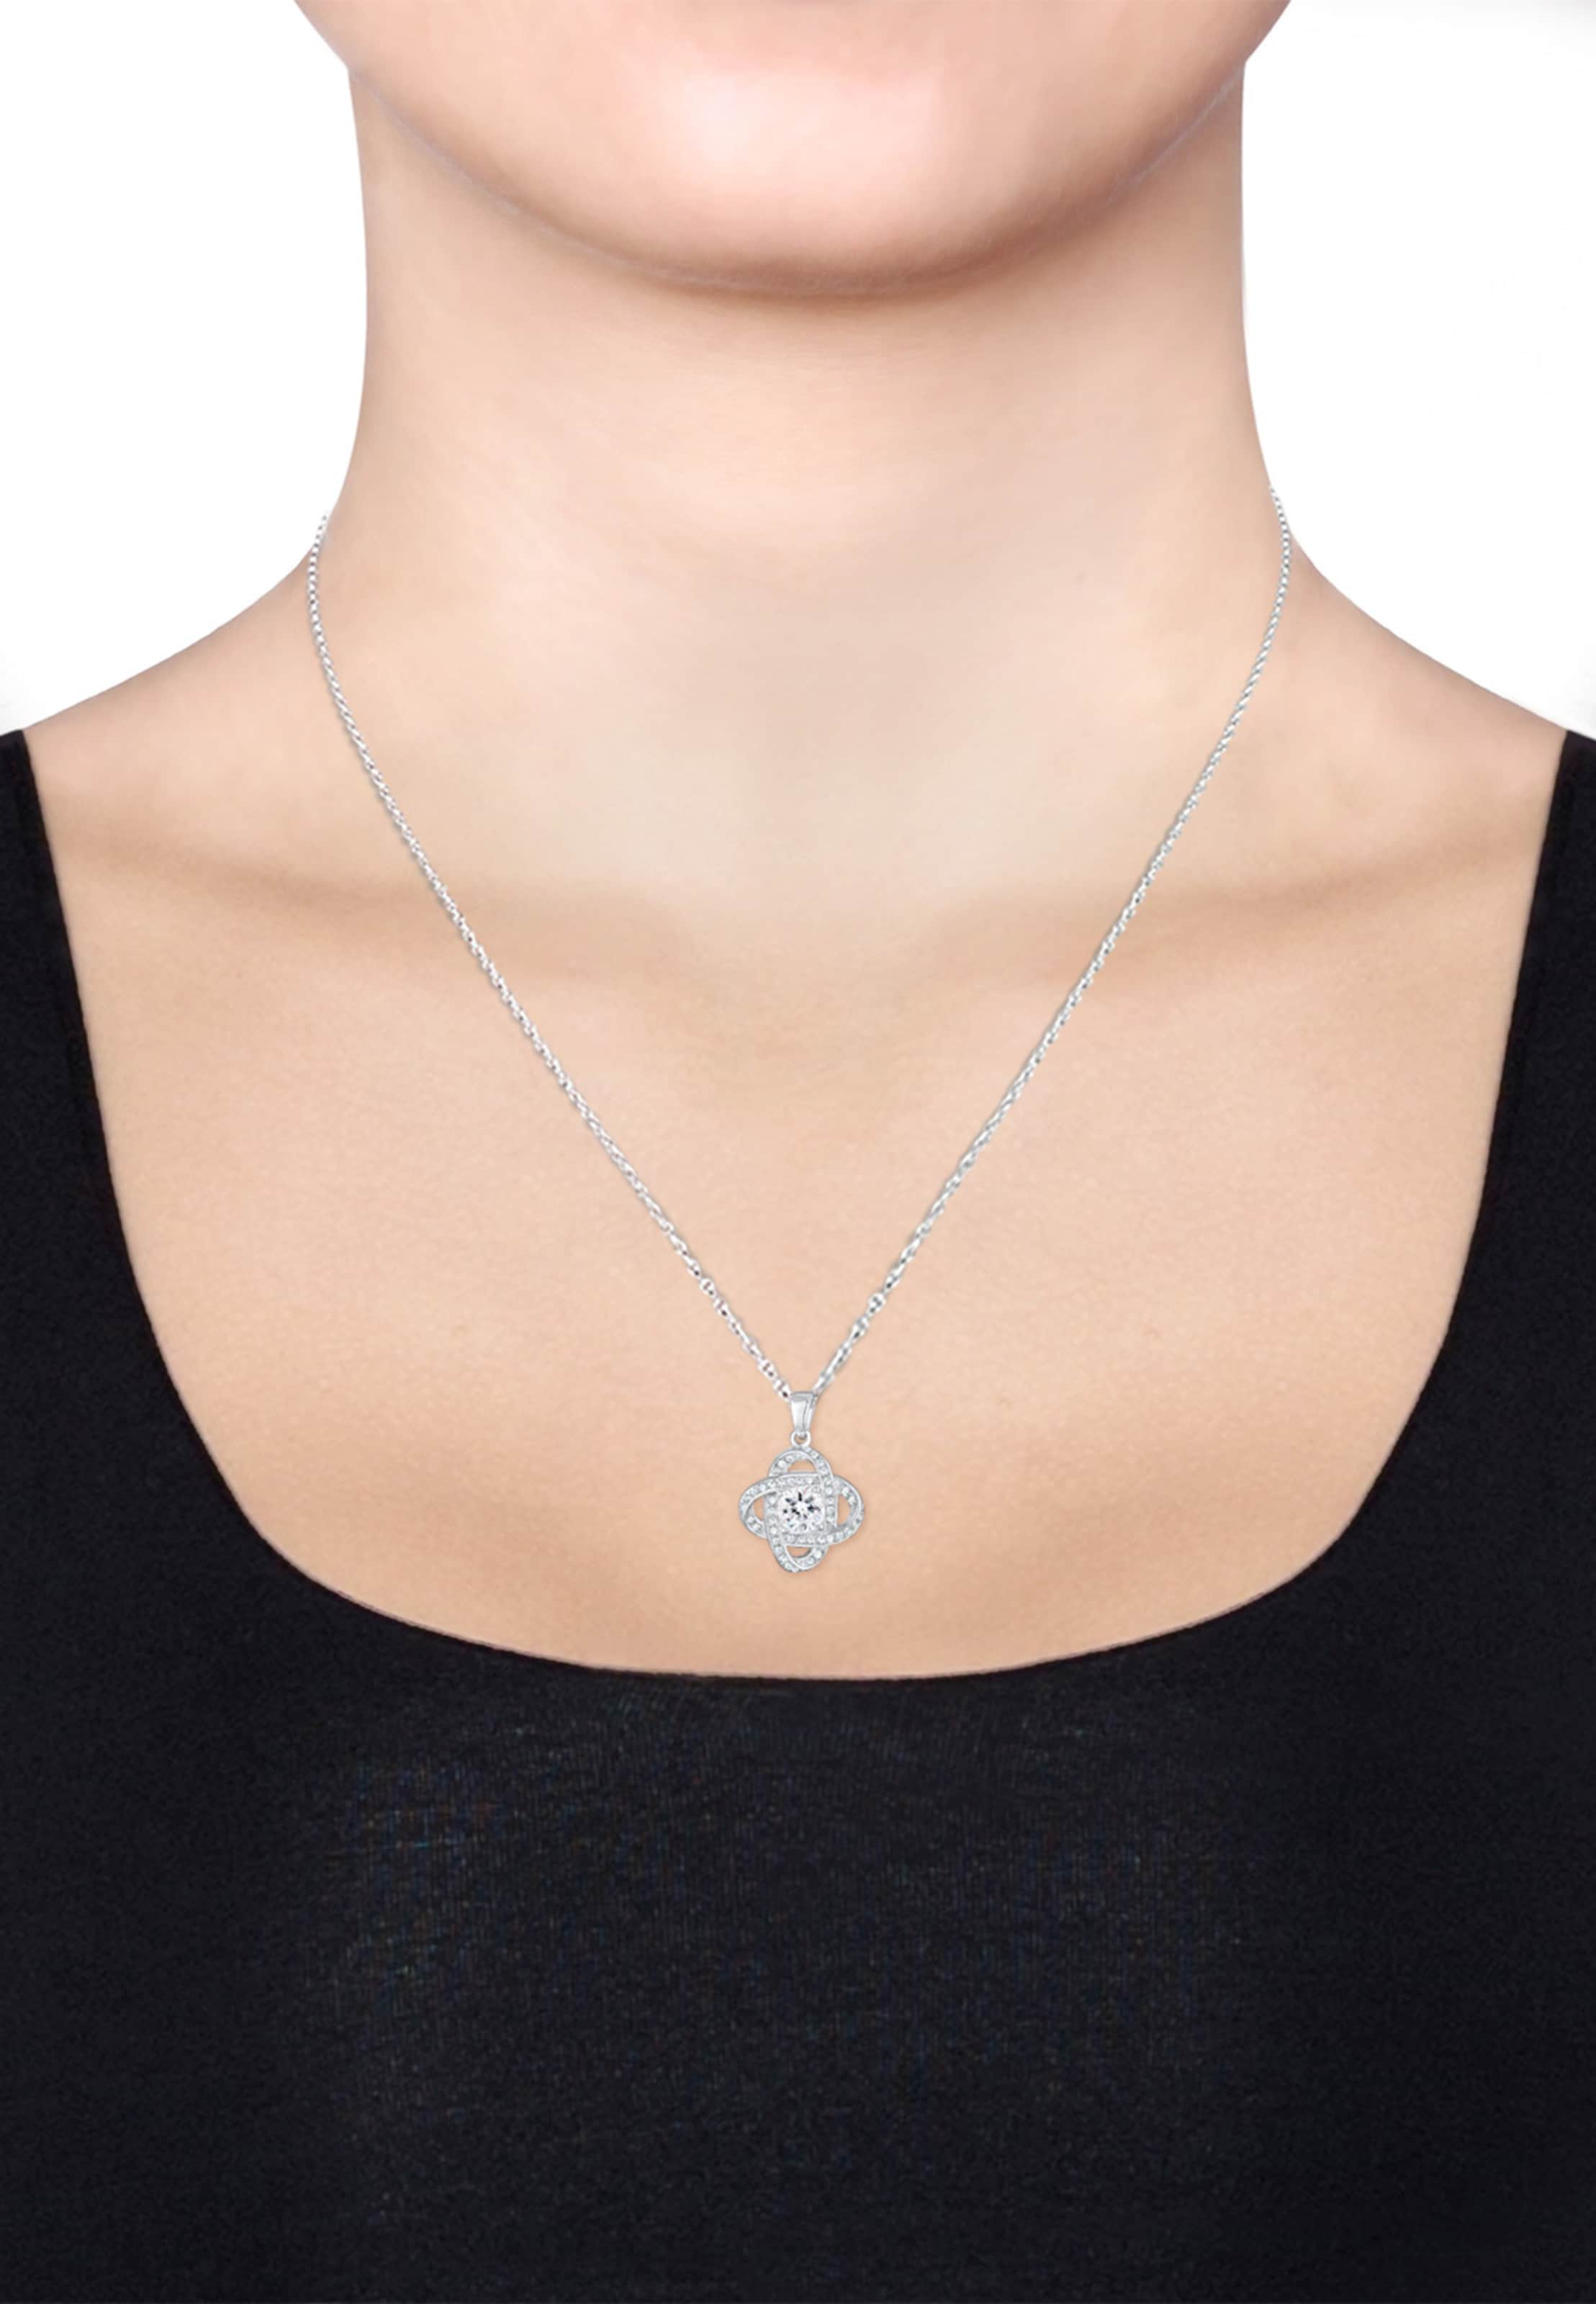 Elli 'knoten' Elli Silber 'knoten' Halskette In Halskette OXPTwZiku